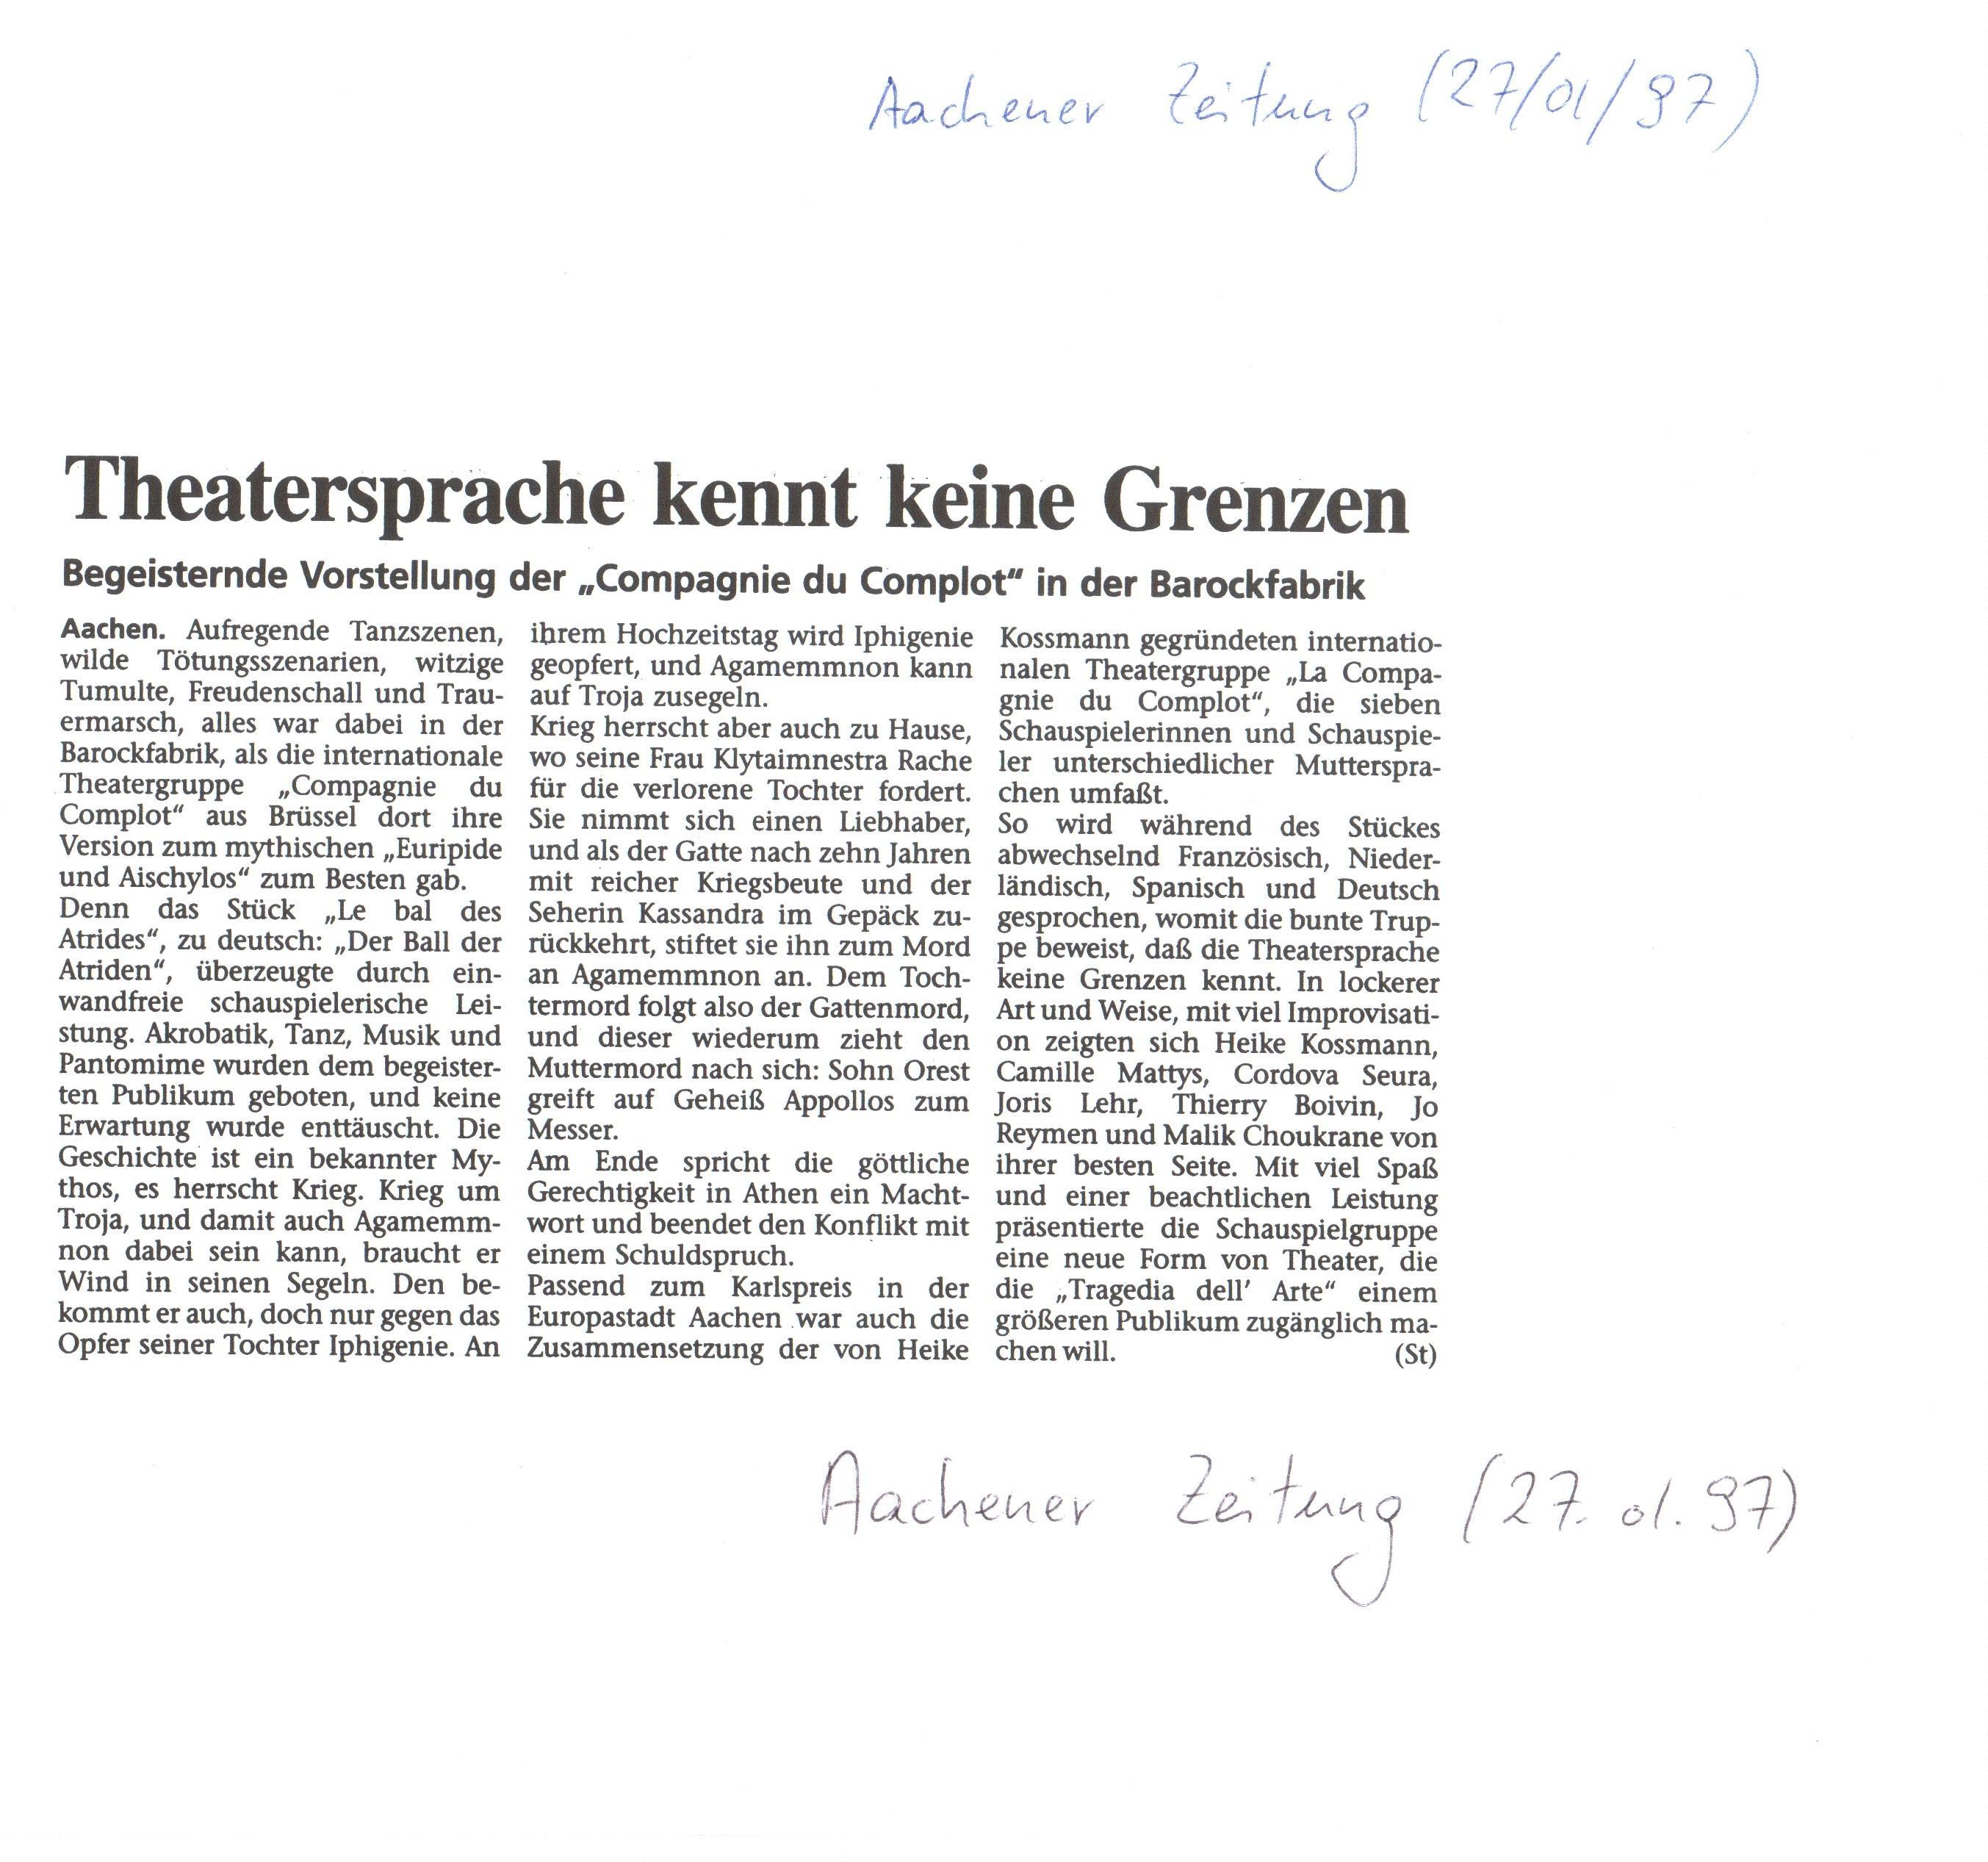 7) Aachener Zeitung